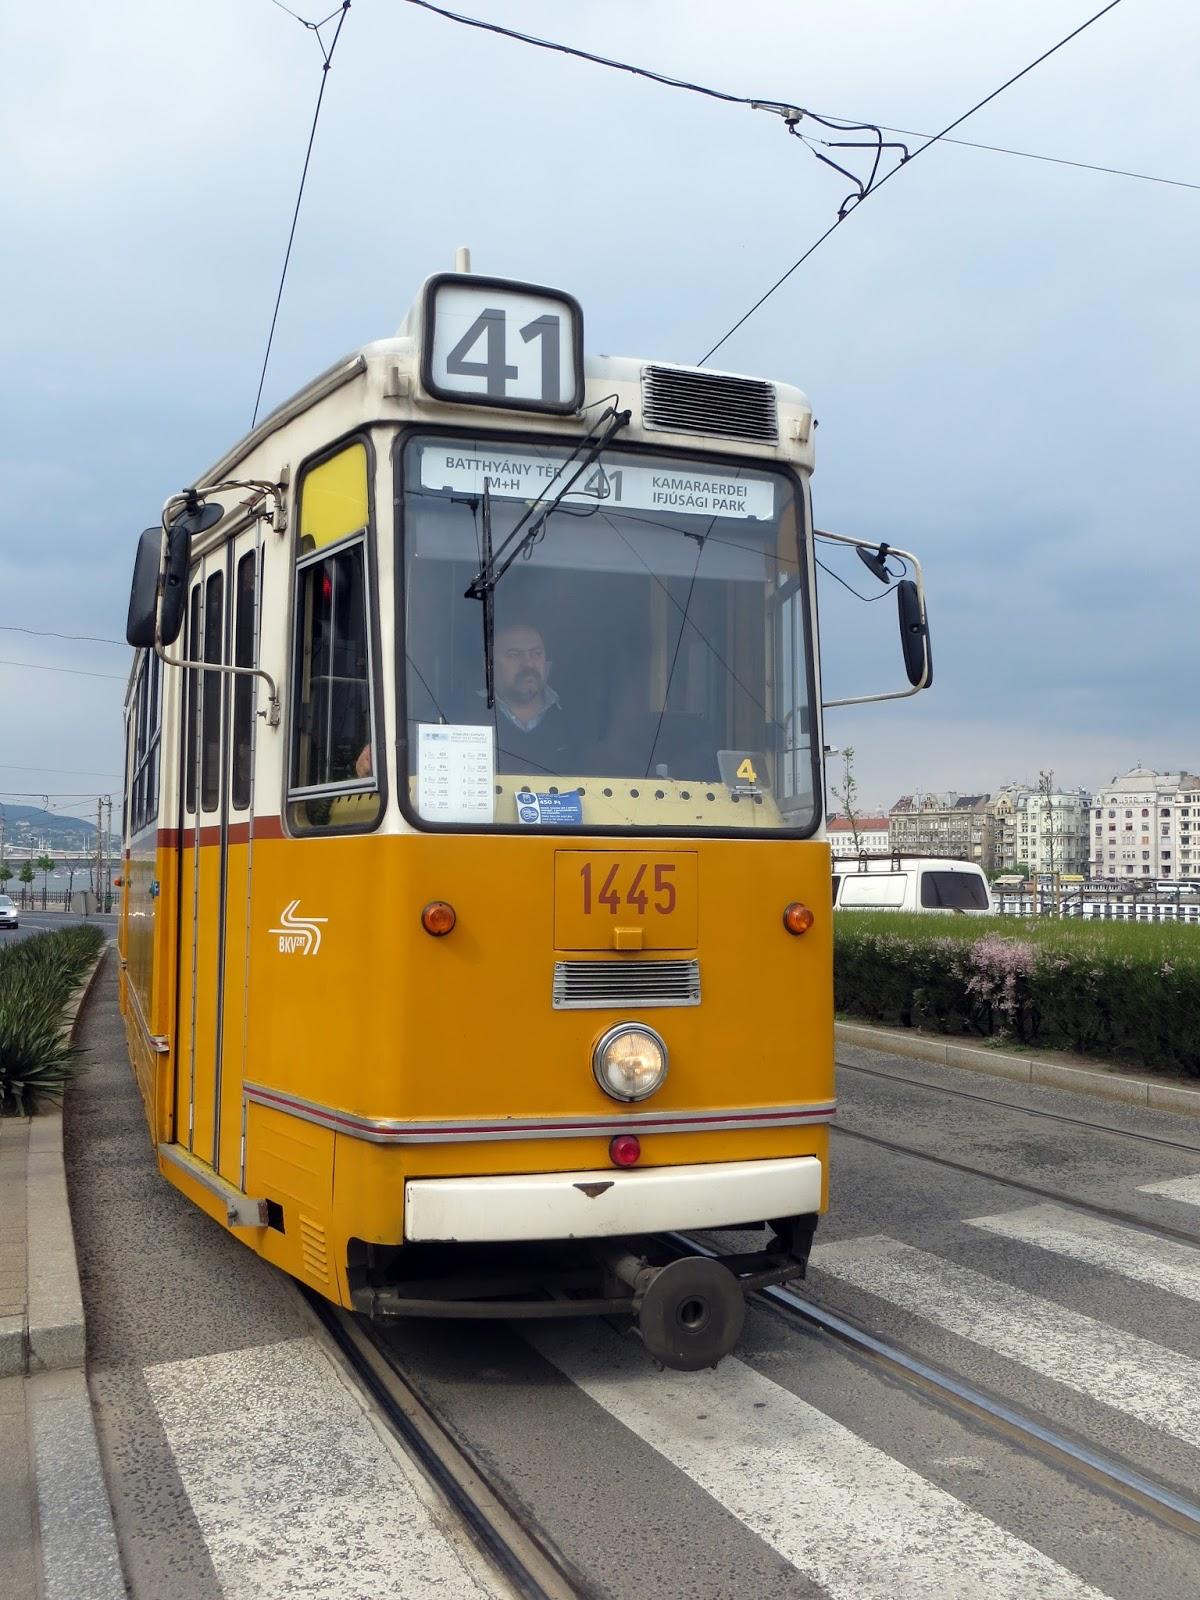 Budapest, photography, night time, architecture, travel, blog, adventure, exploration, chain bridge, tram, traditional, transport, history, yellow